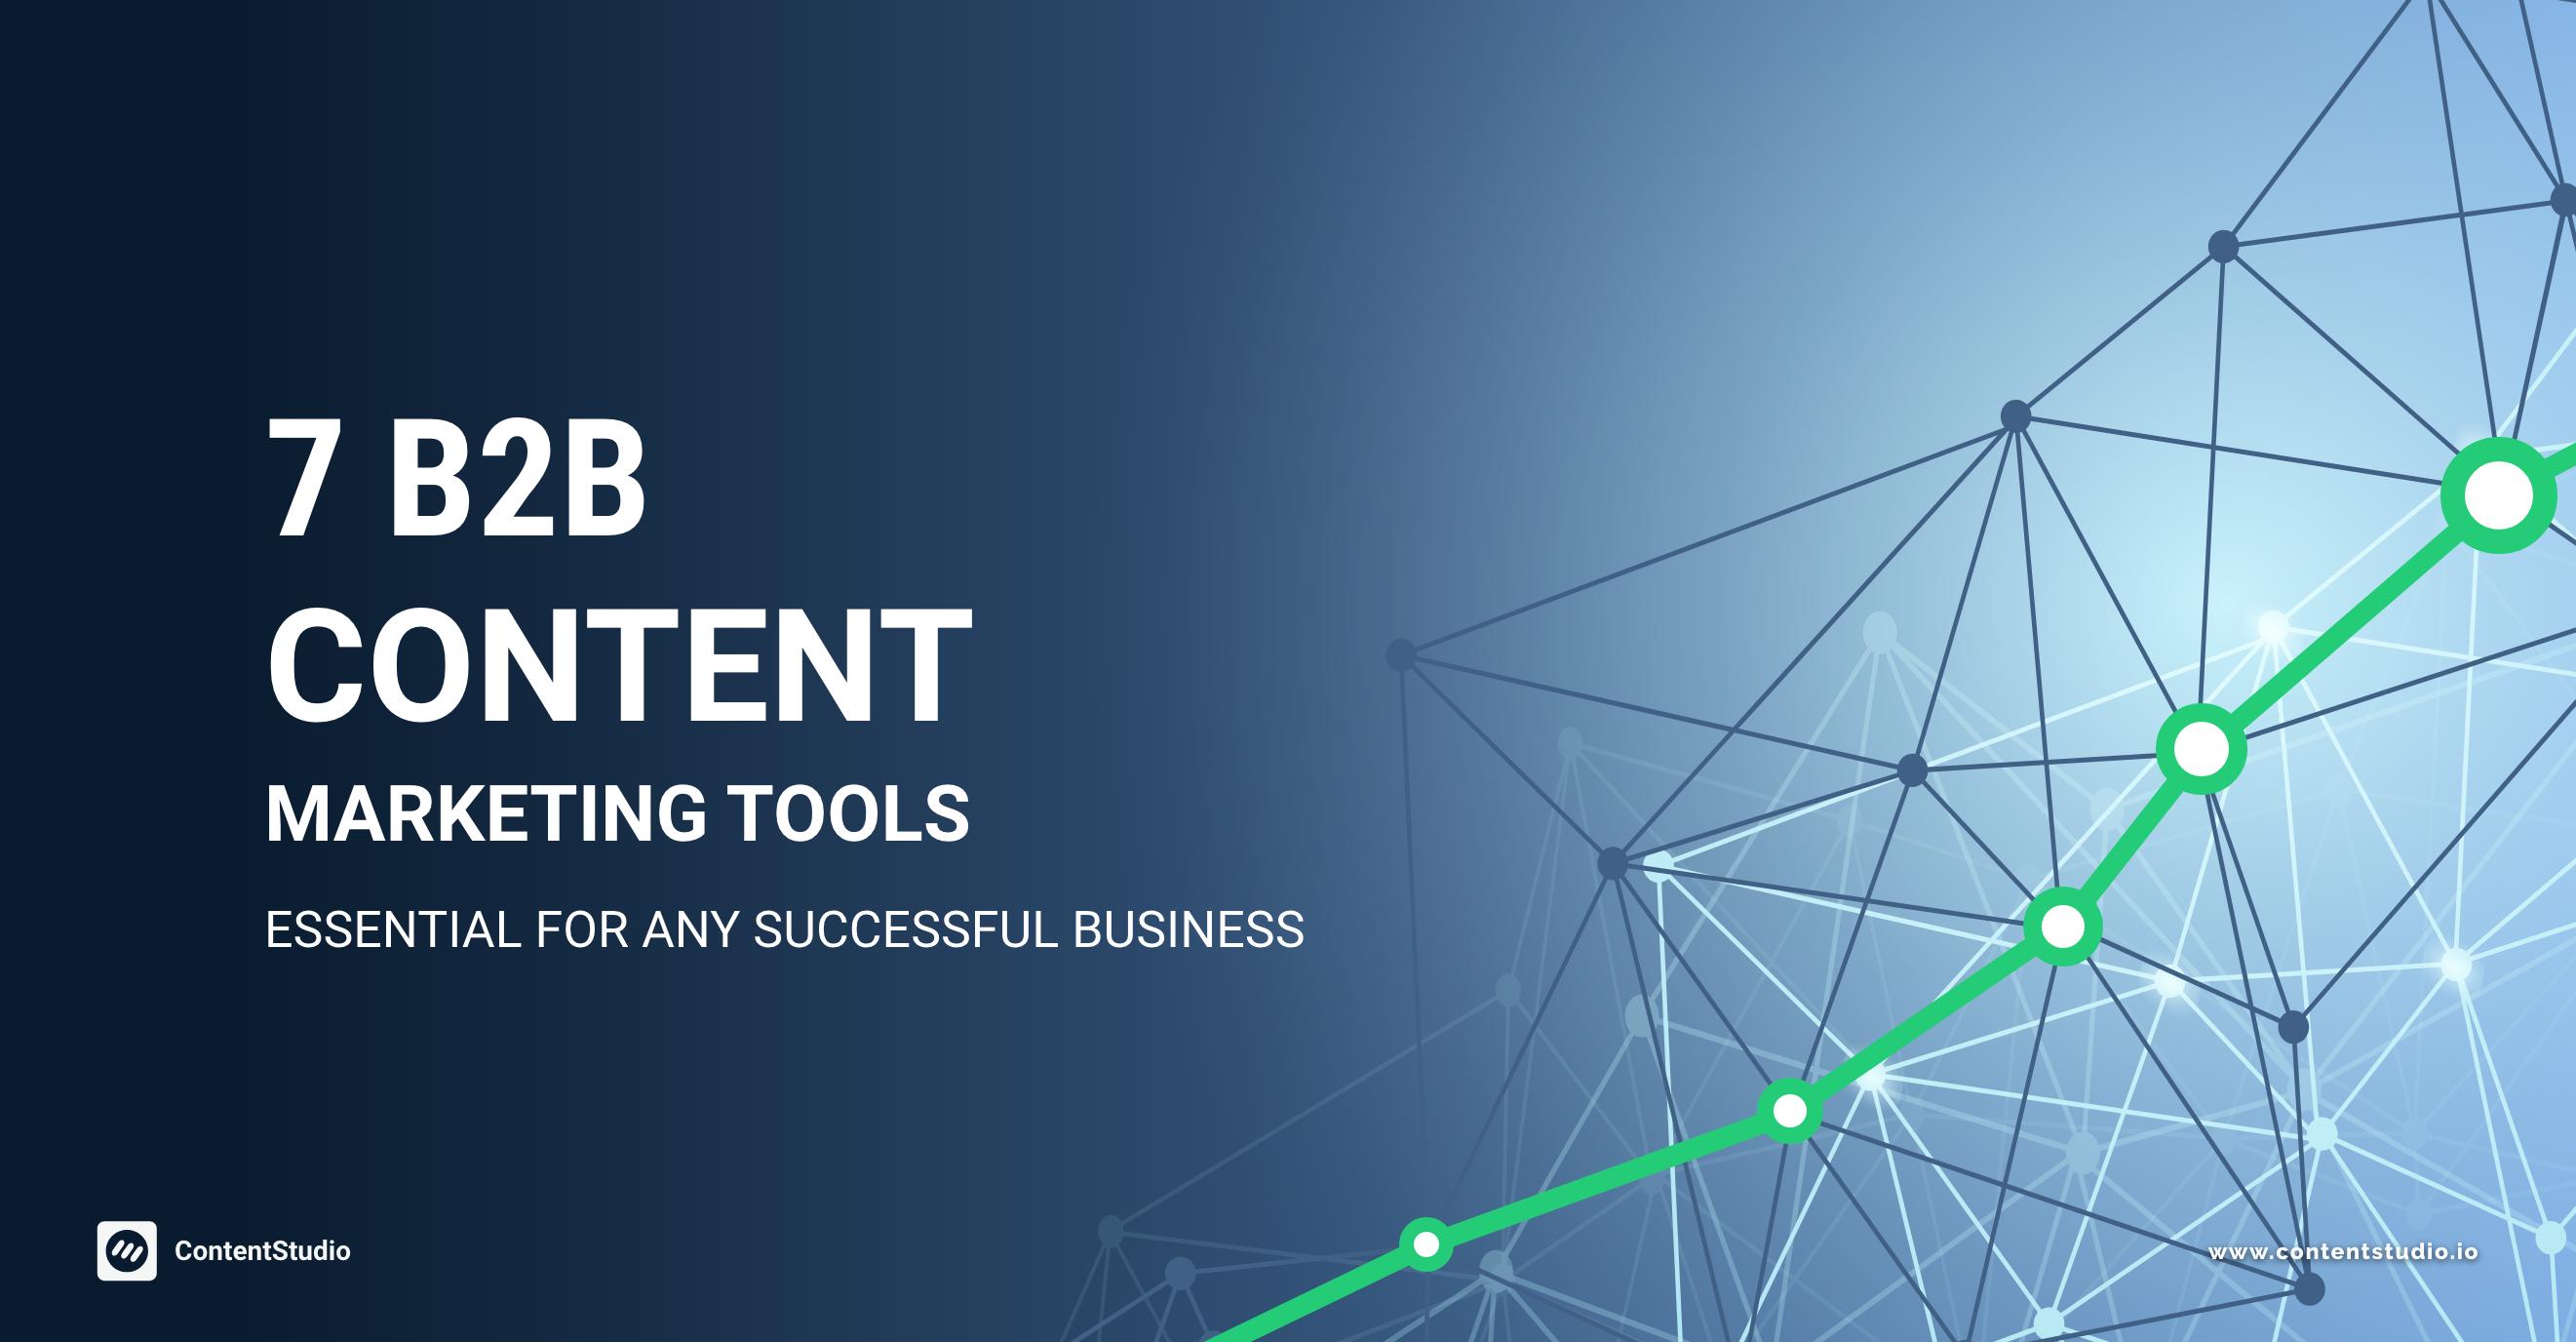 b2b content marketing tool - CotnentStudio